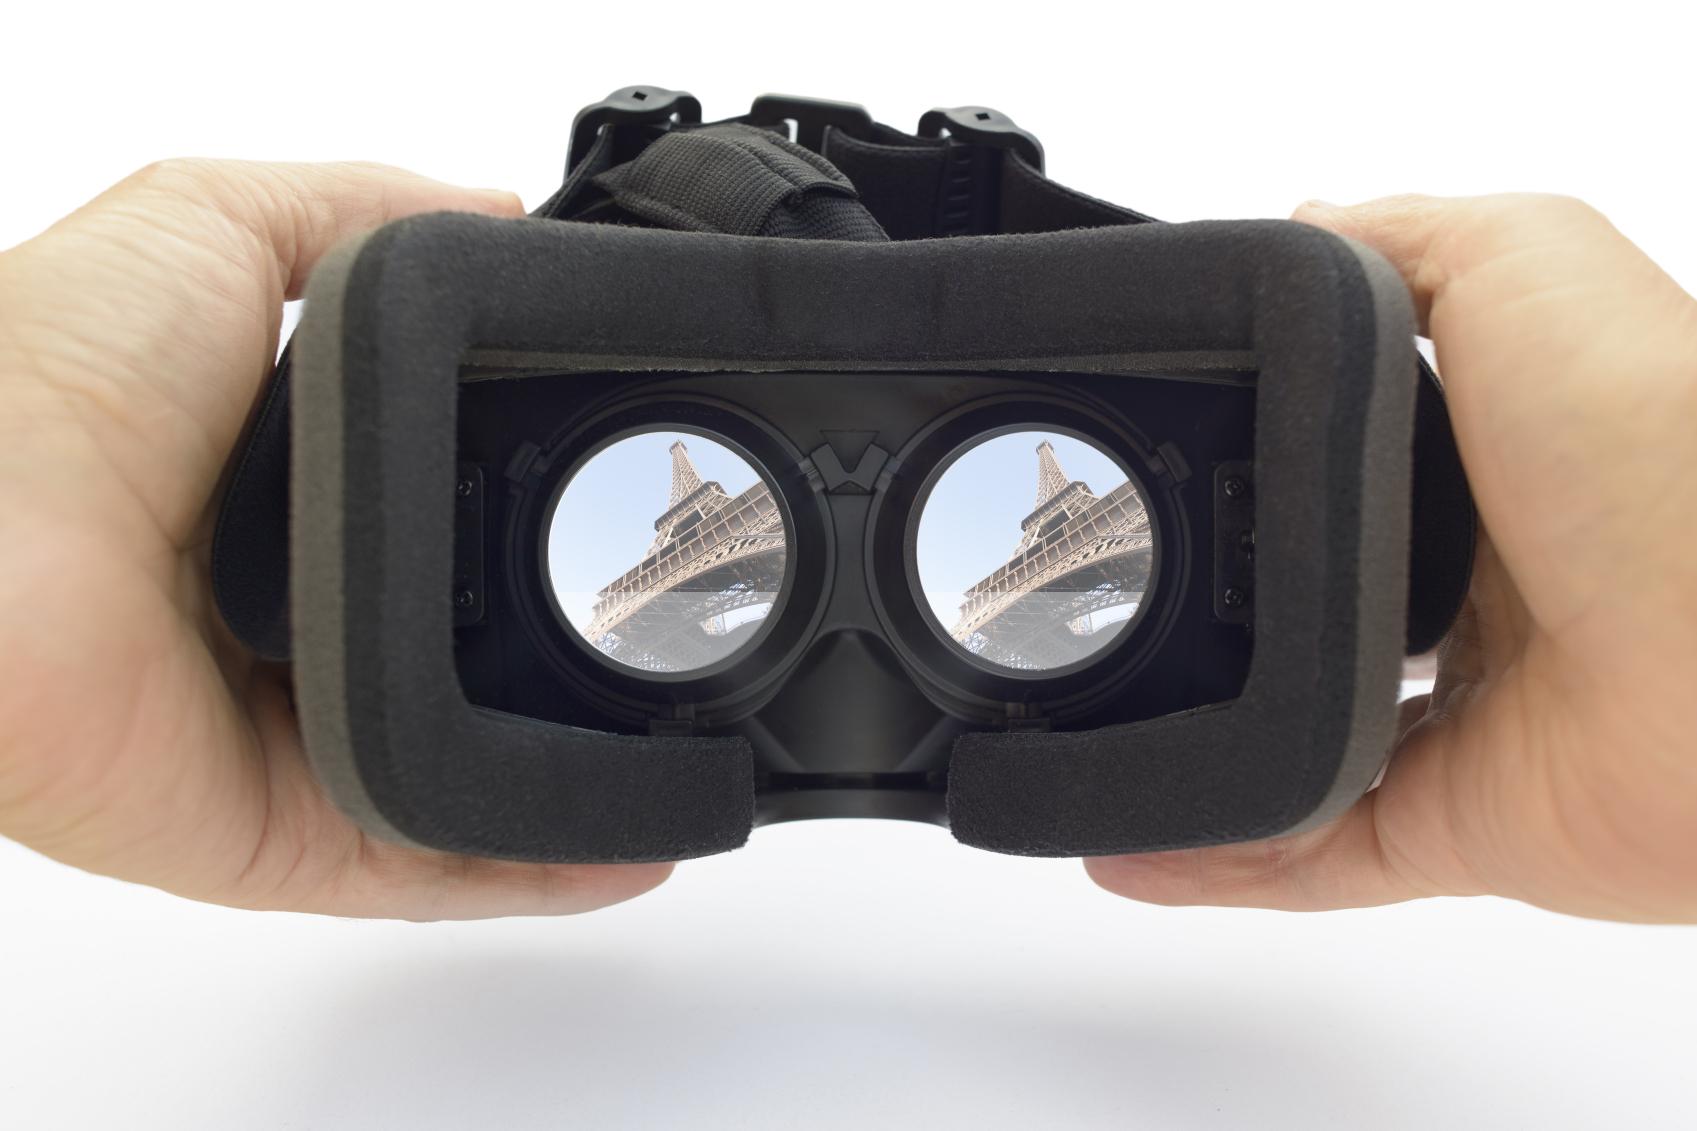 f9a5c19e34a Samsung Gear VR vs Google Cardboard  Best VR Headsets to Buy - Gearbrain